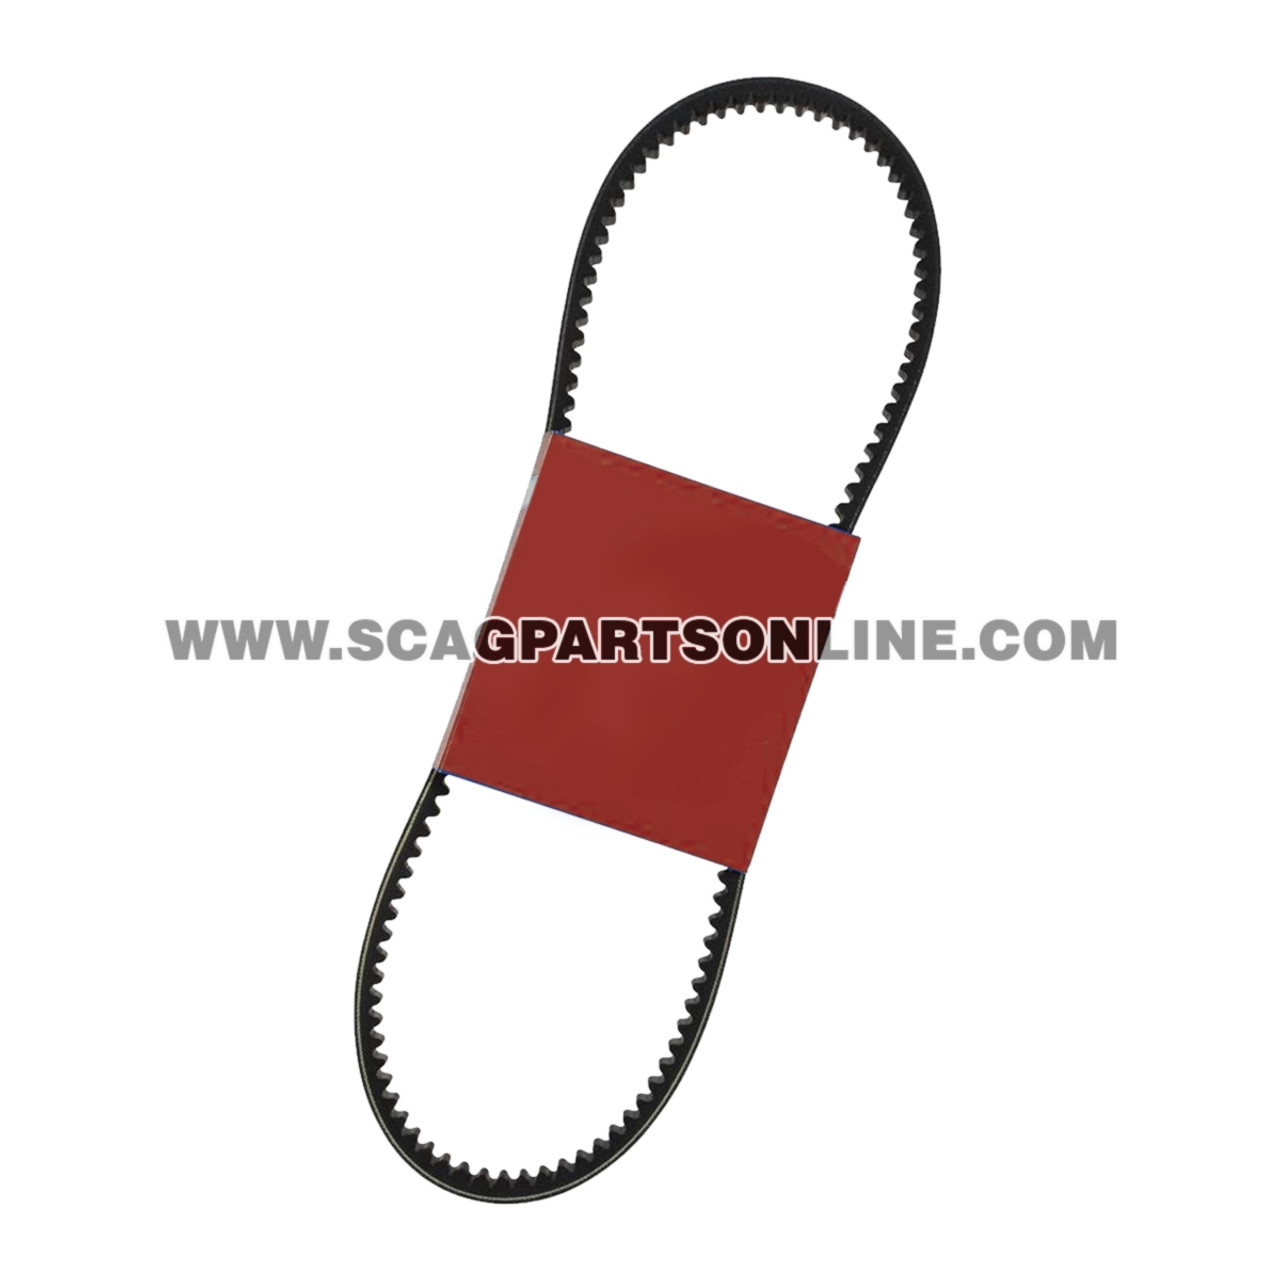 Scag Replacement Belt 481460 OEM